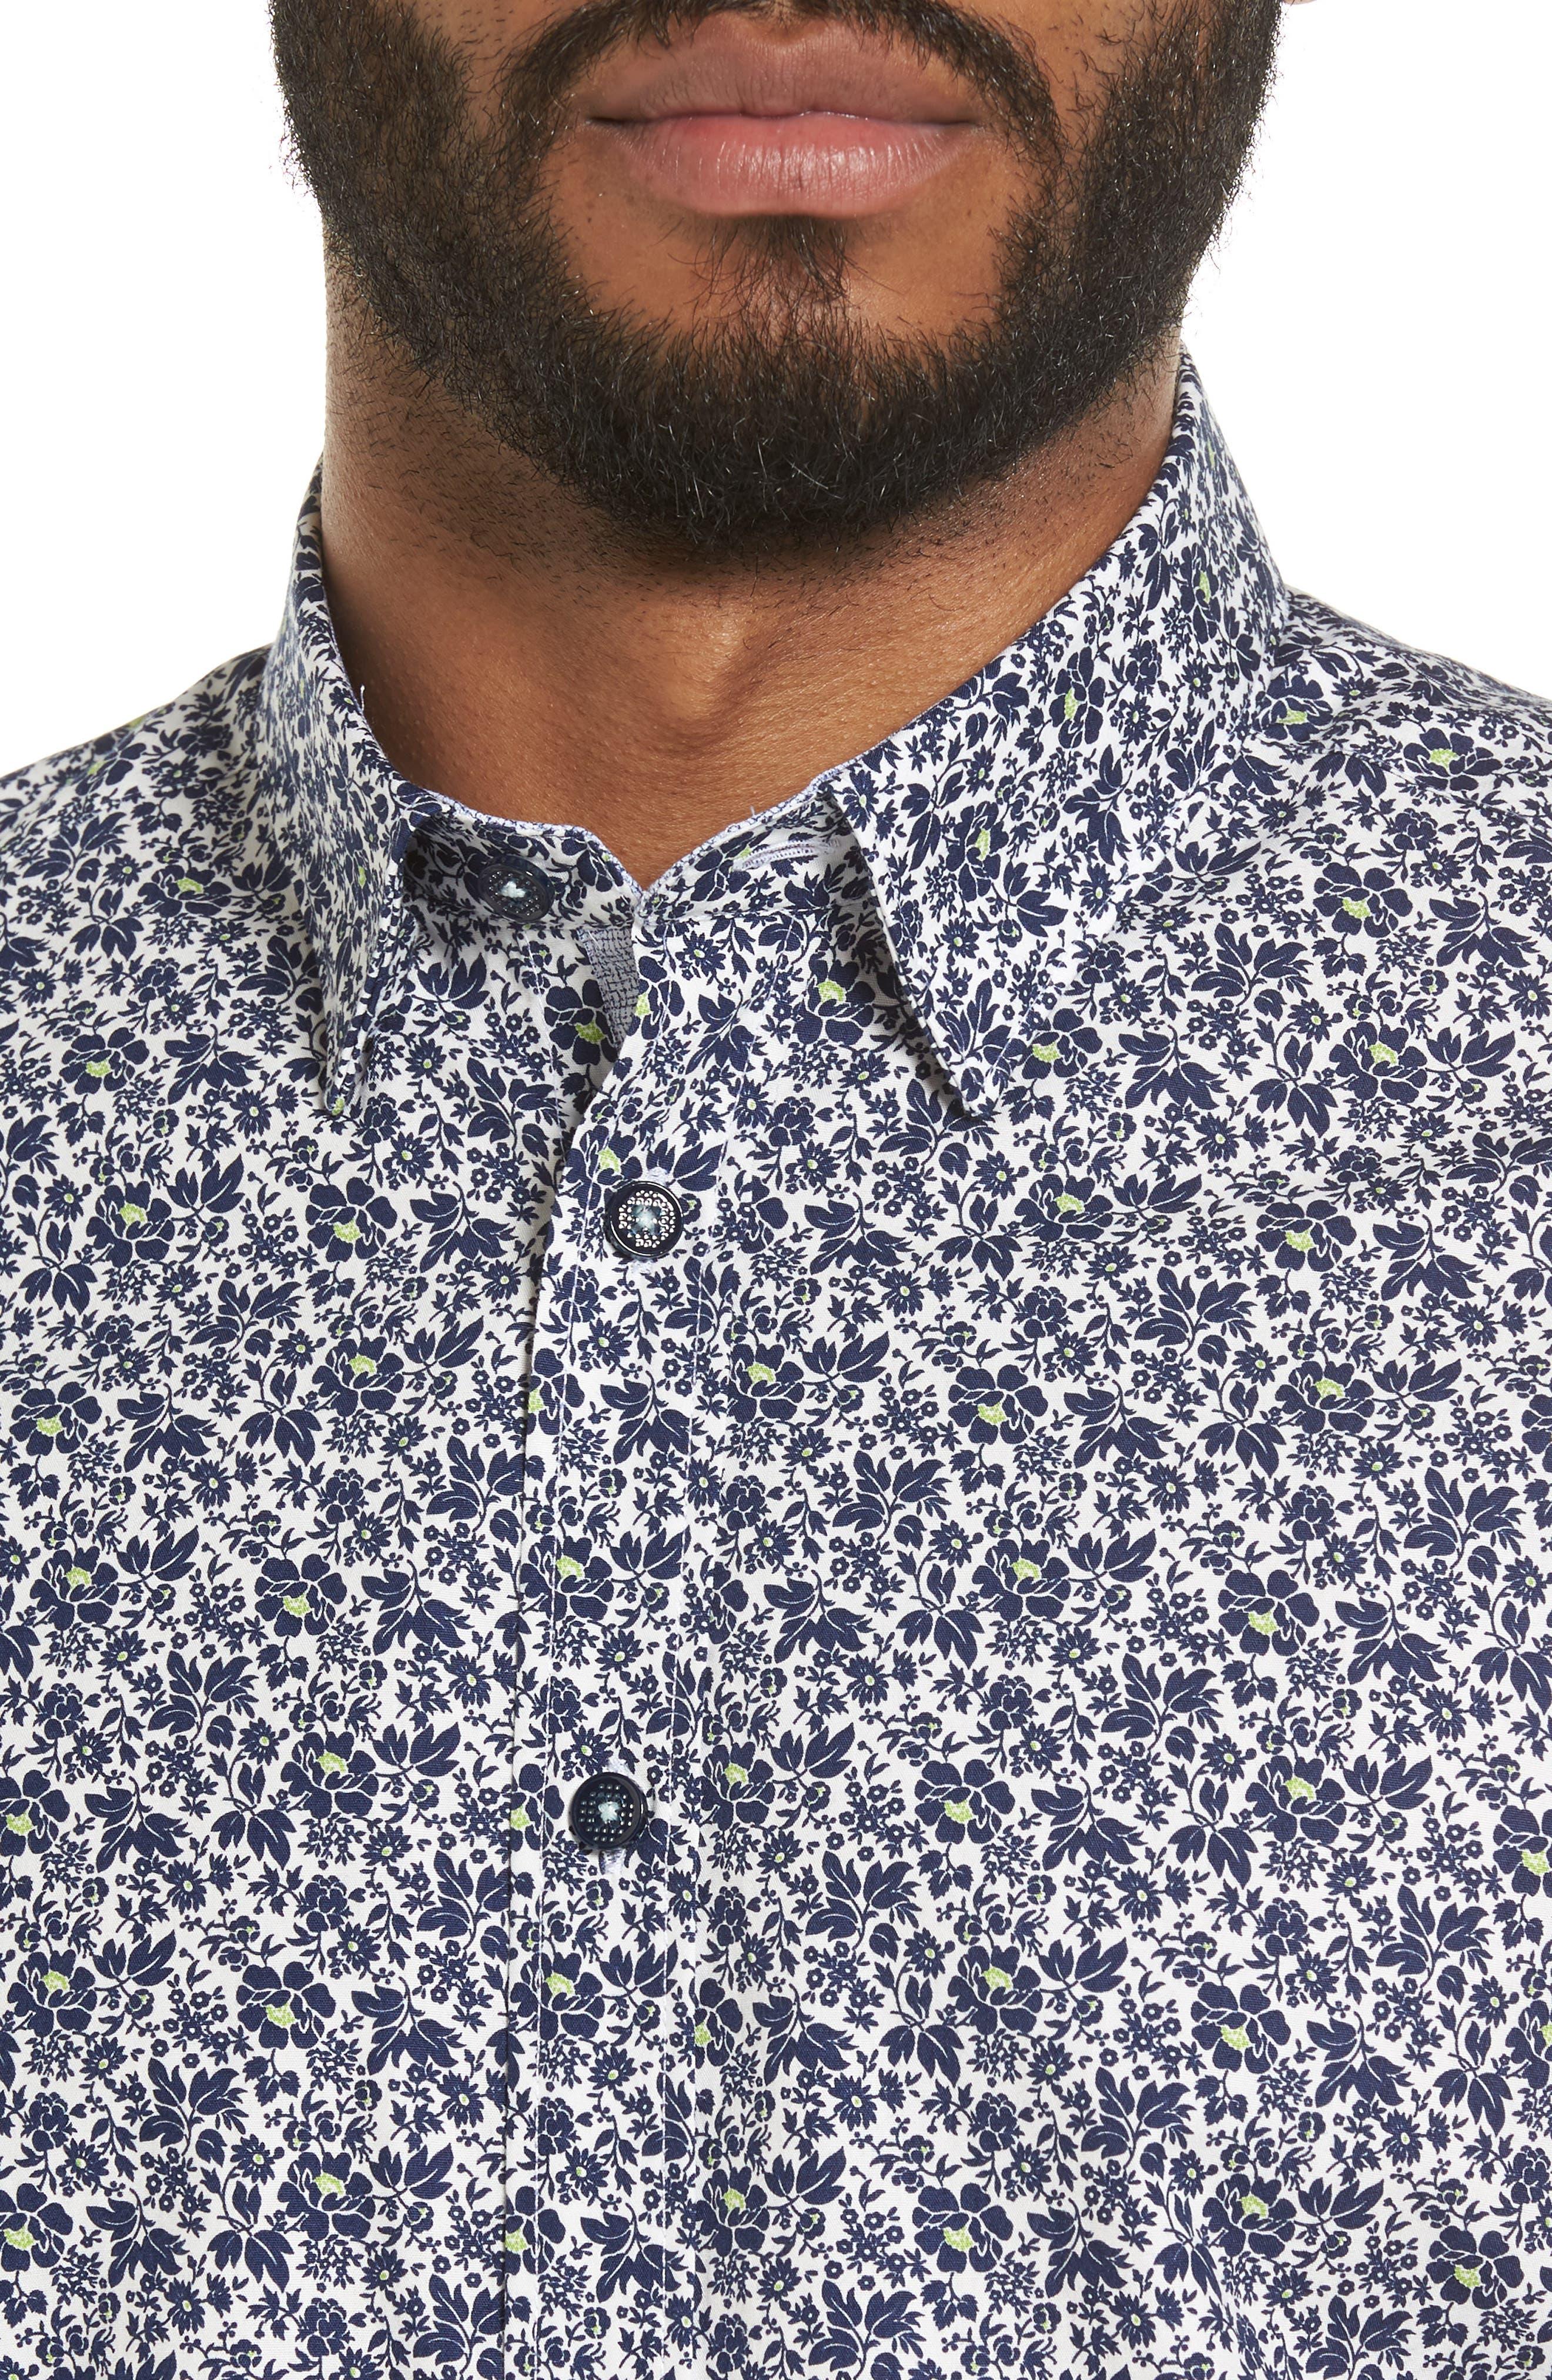 Alygar Slim Fit Floral Woven Shirt,                             Alternate thumbnail 4, color,                             402